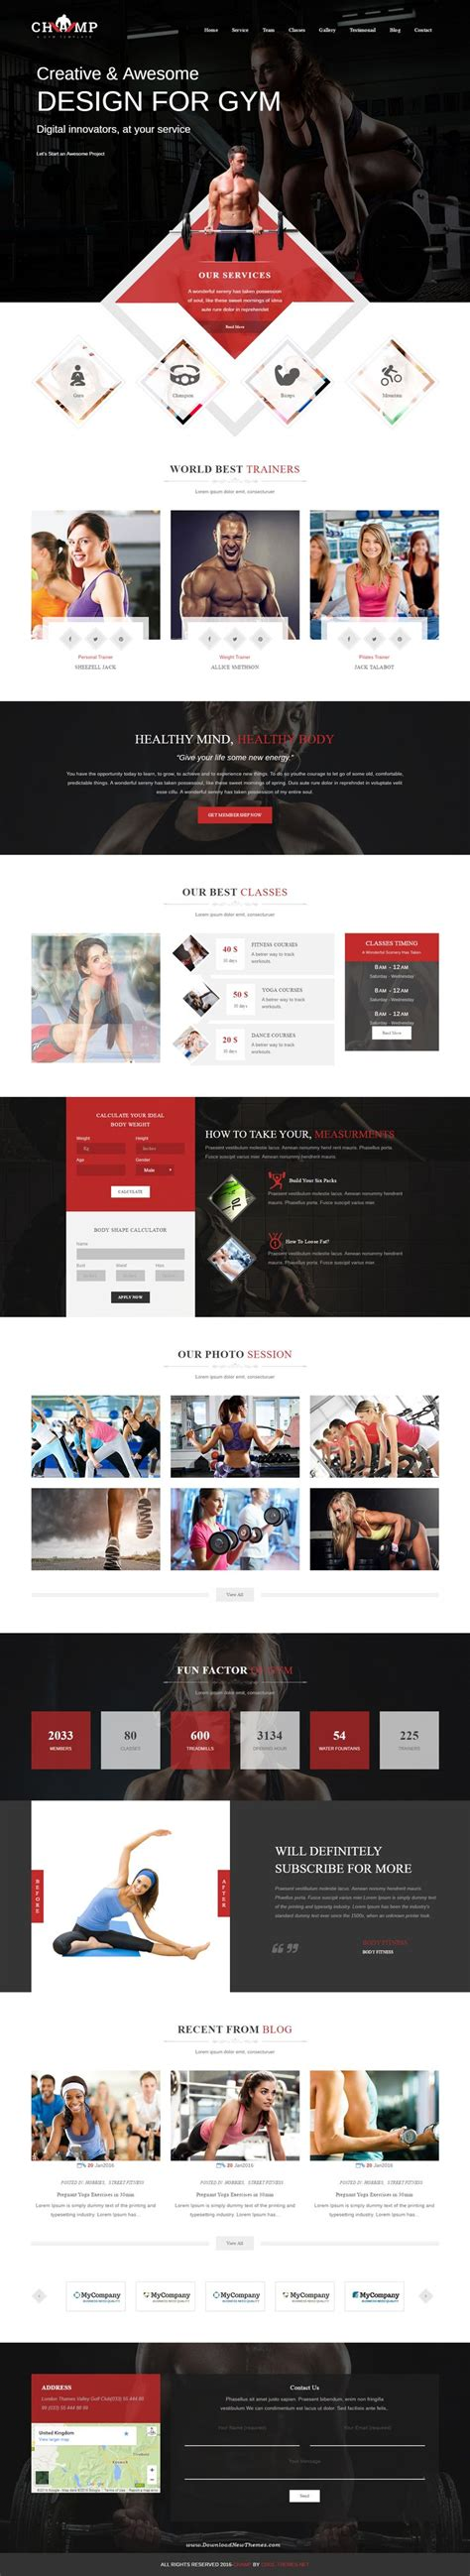 designspiration wordpress theme 1121 best inspiration web images on pinterest design